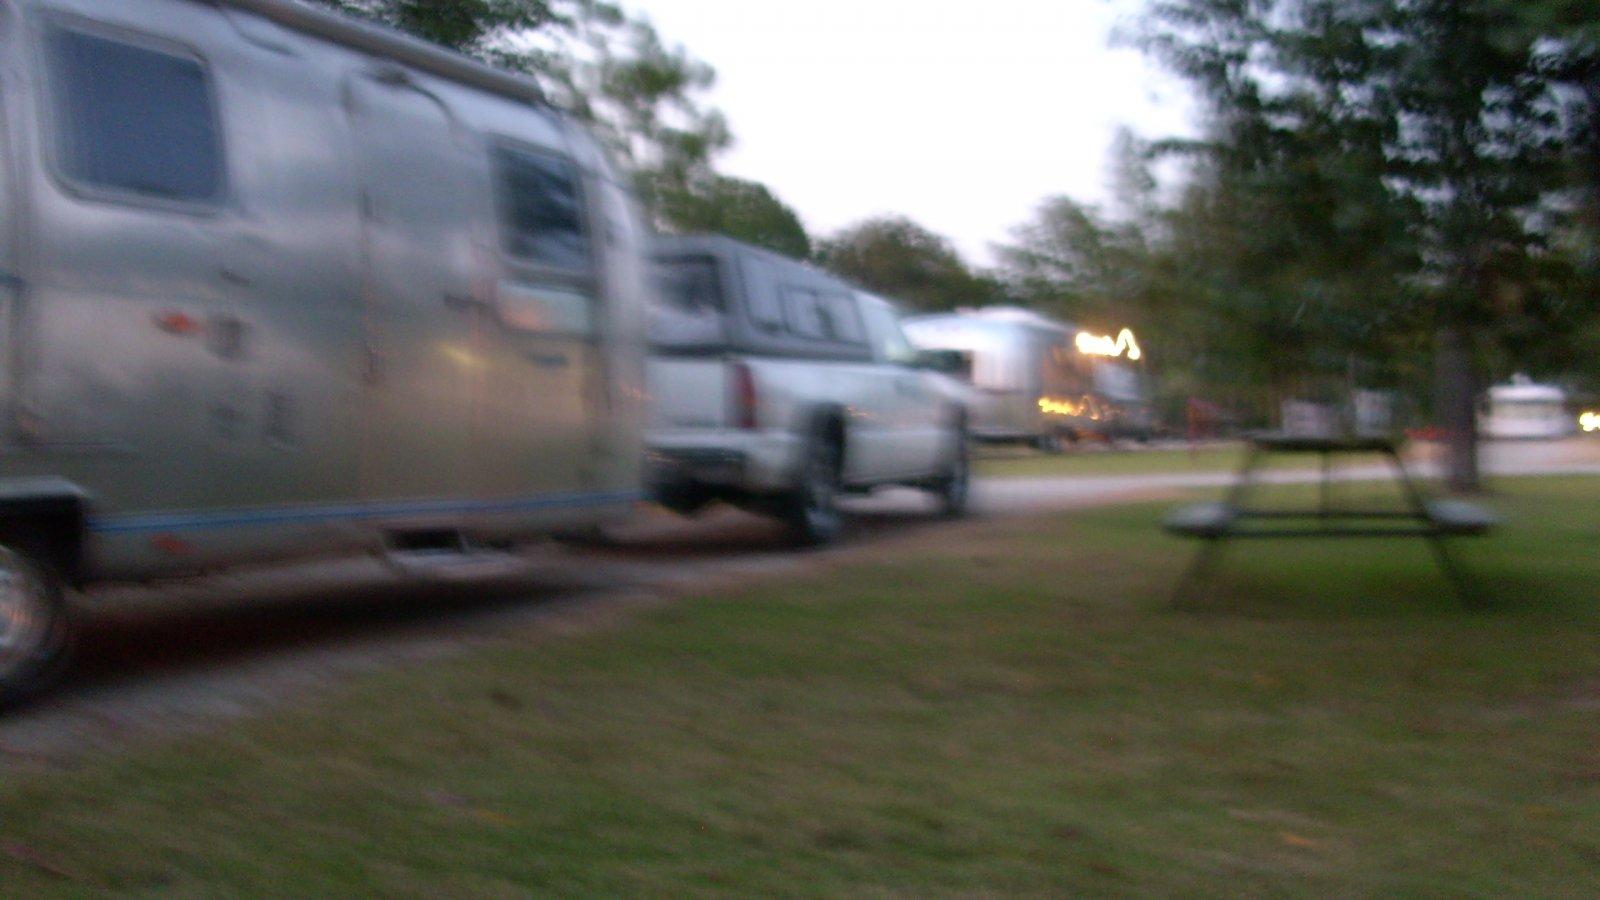 Click image for larger version  Name:Arkansas and Oklahoma 017.jpg Views:75 Size:150.1 KB ID:68594